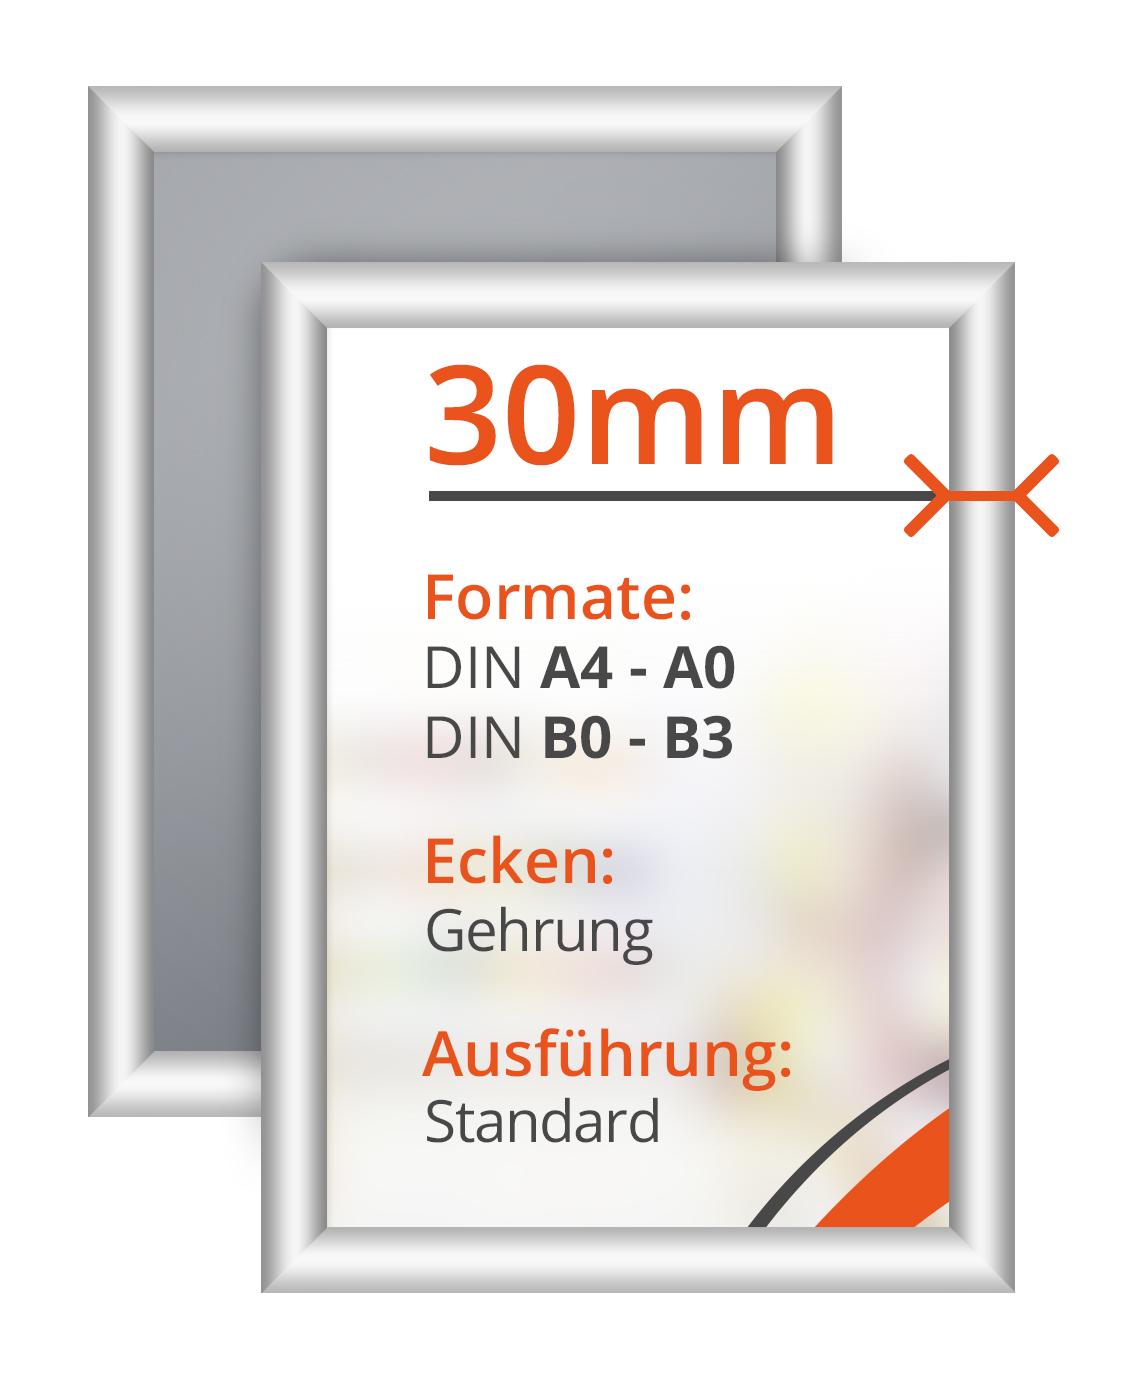 alu klapprahmen 30mm auf gehrung aluminium aspos display gmbh co kg. Black Bedroom Furniture Sets. Home Design Ideas